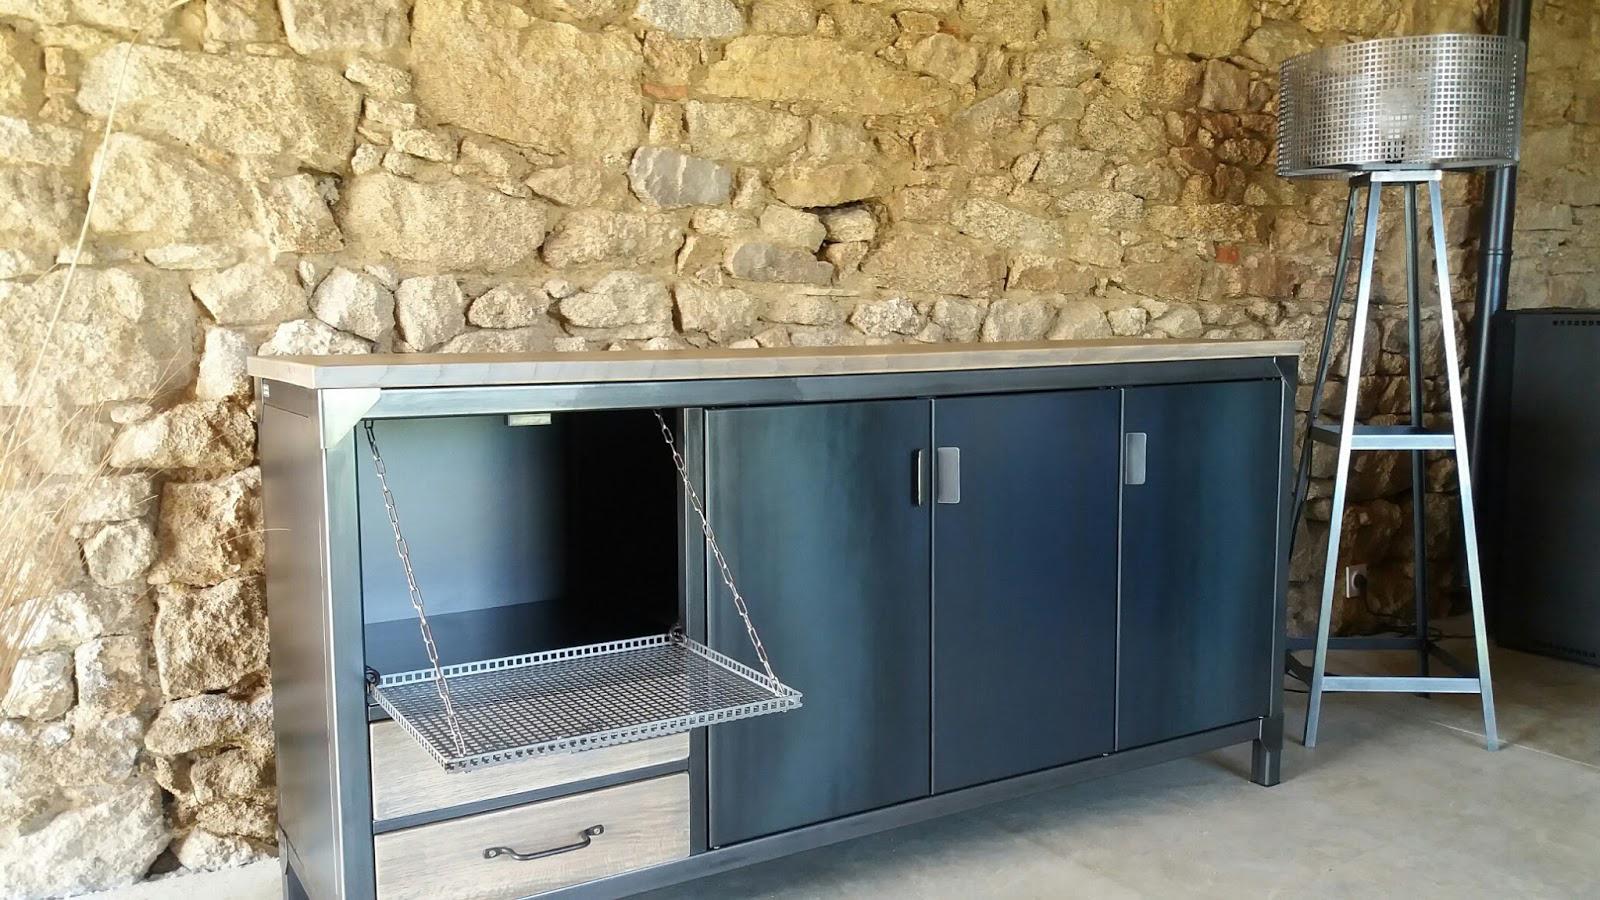 c factory cr ations meuble style industriel sur mesures. Black Bedroom Furniture Sets. Home Design Ideas